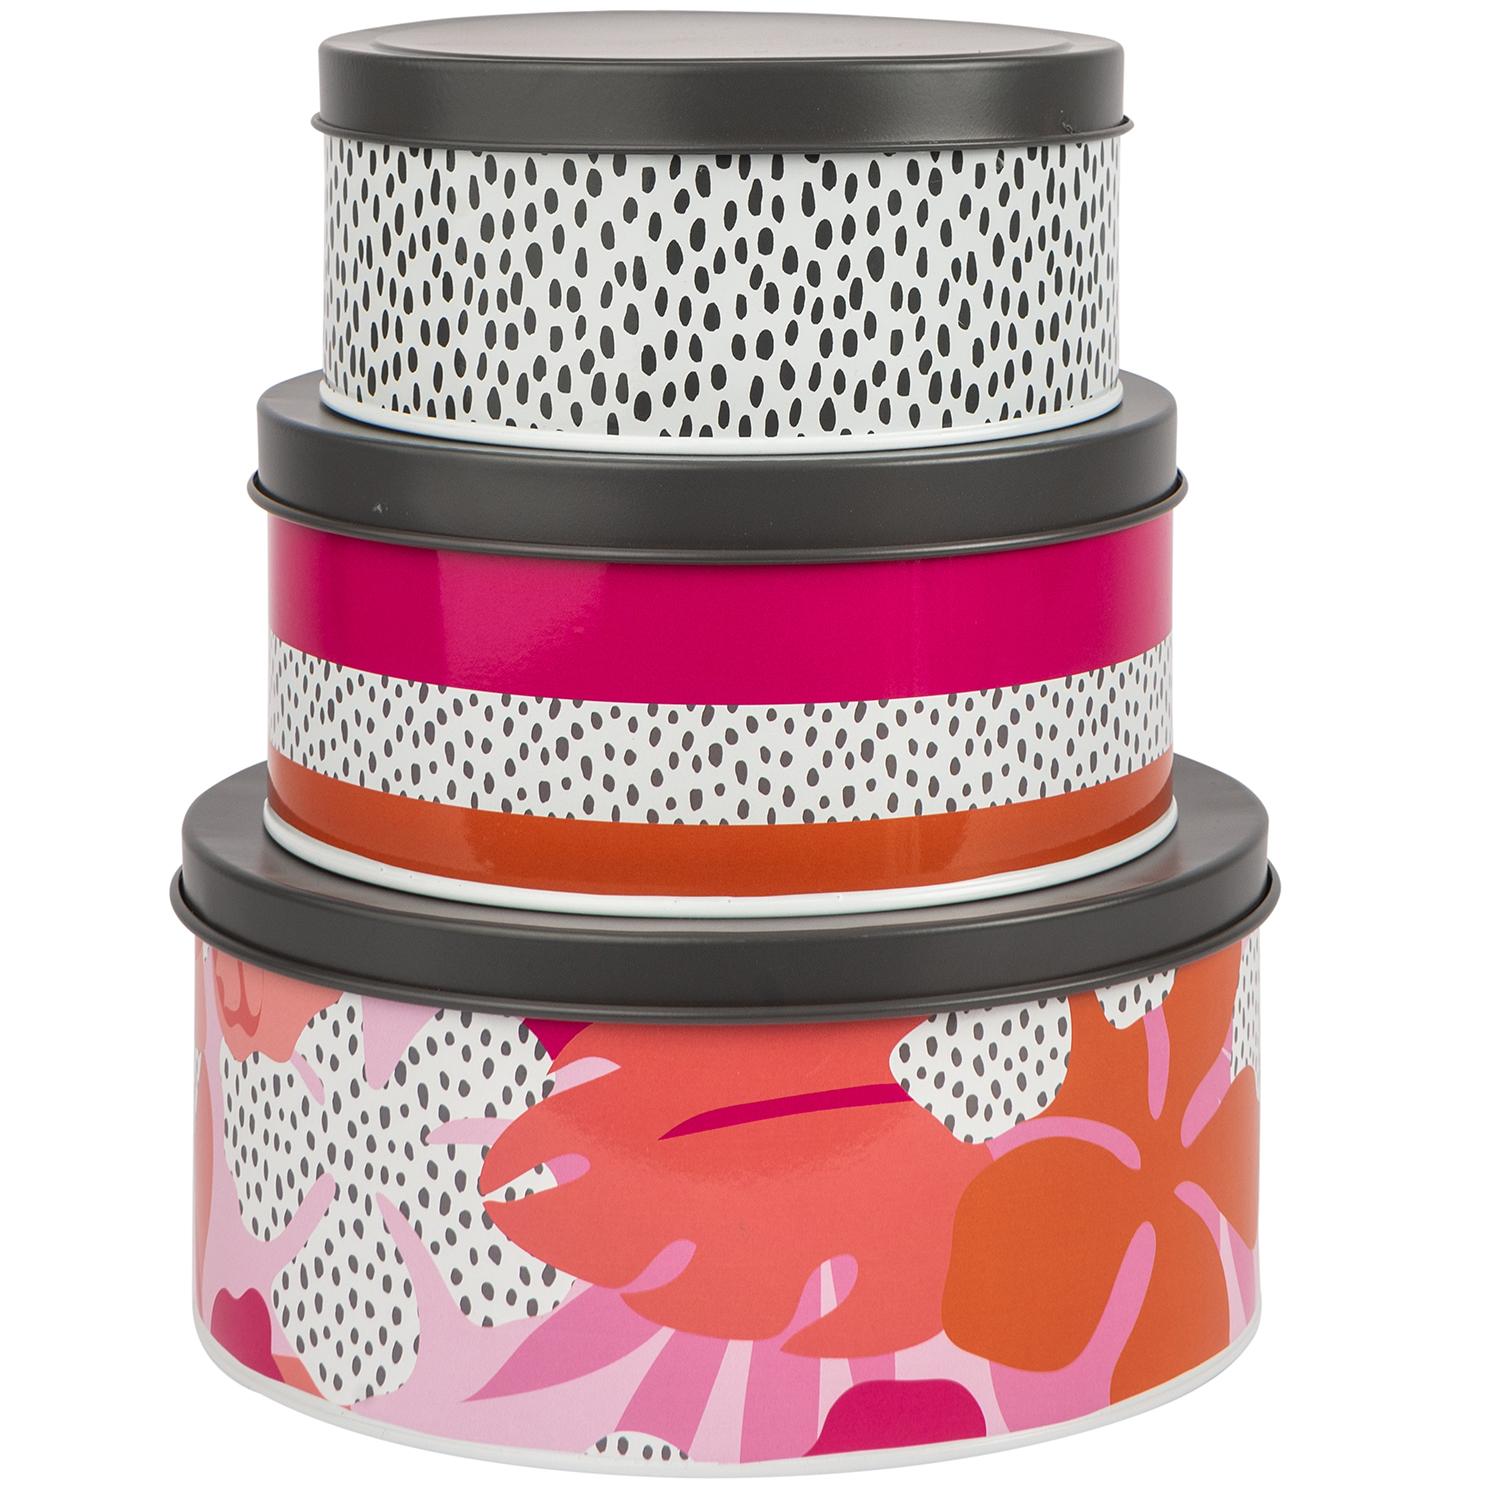 Navigate – Summerhouse 'Tribal Fusion' Set of 3 Nesting Tins